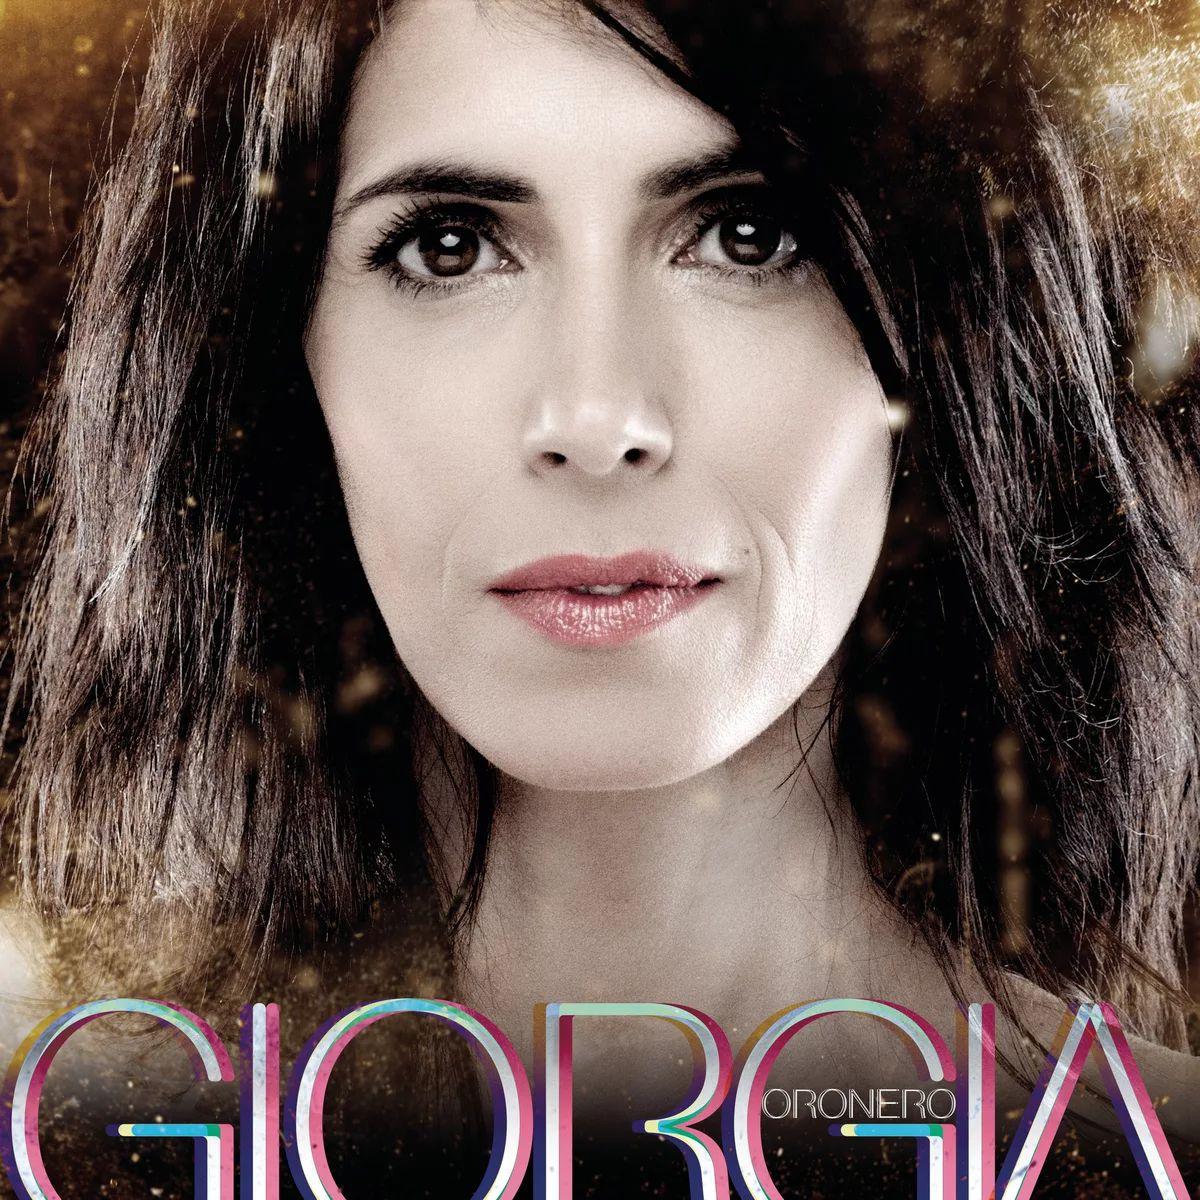 Giorgia Giorgia. Oronero Live (2 LP) giorgia